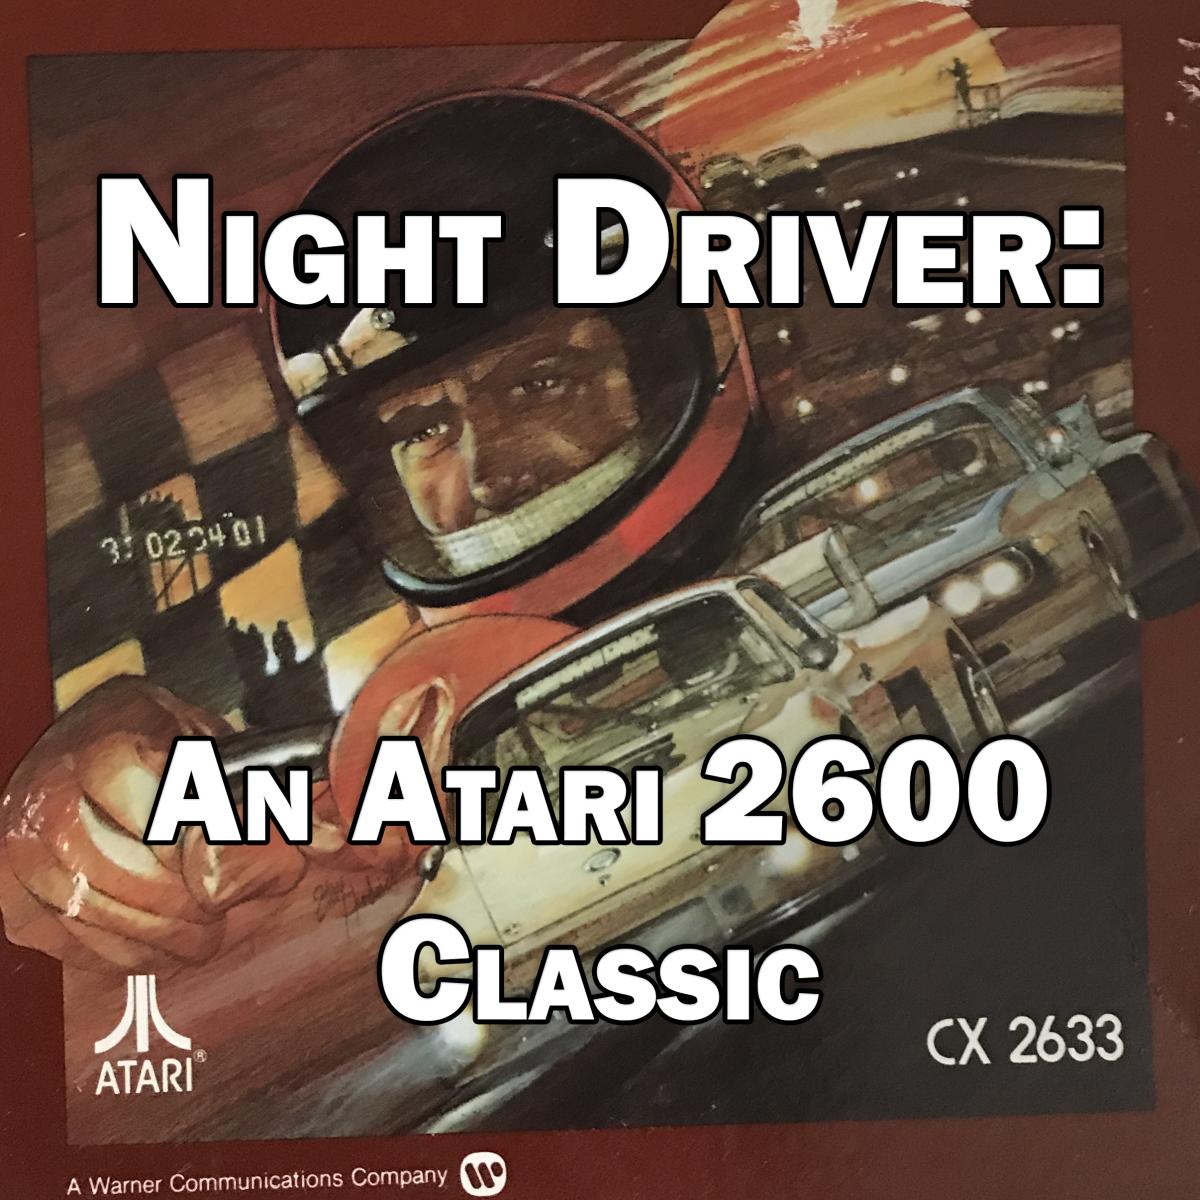 Night Driver: An Atari 2600 Classic